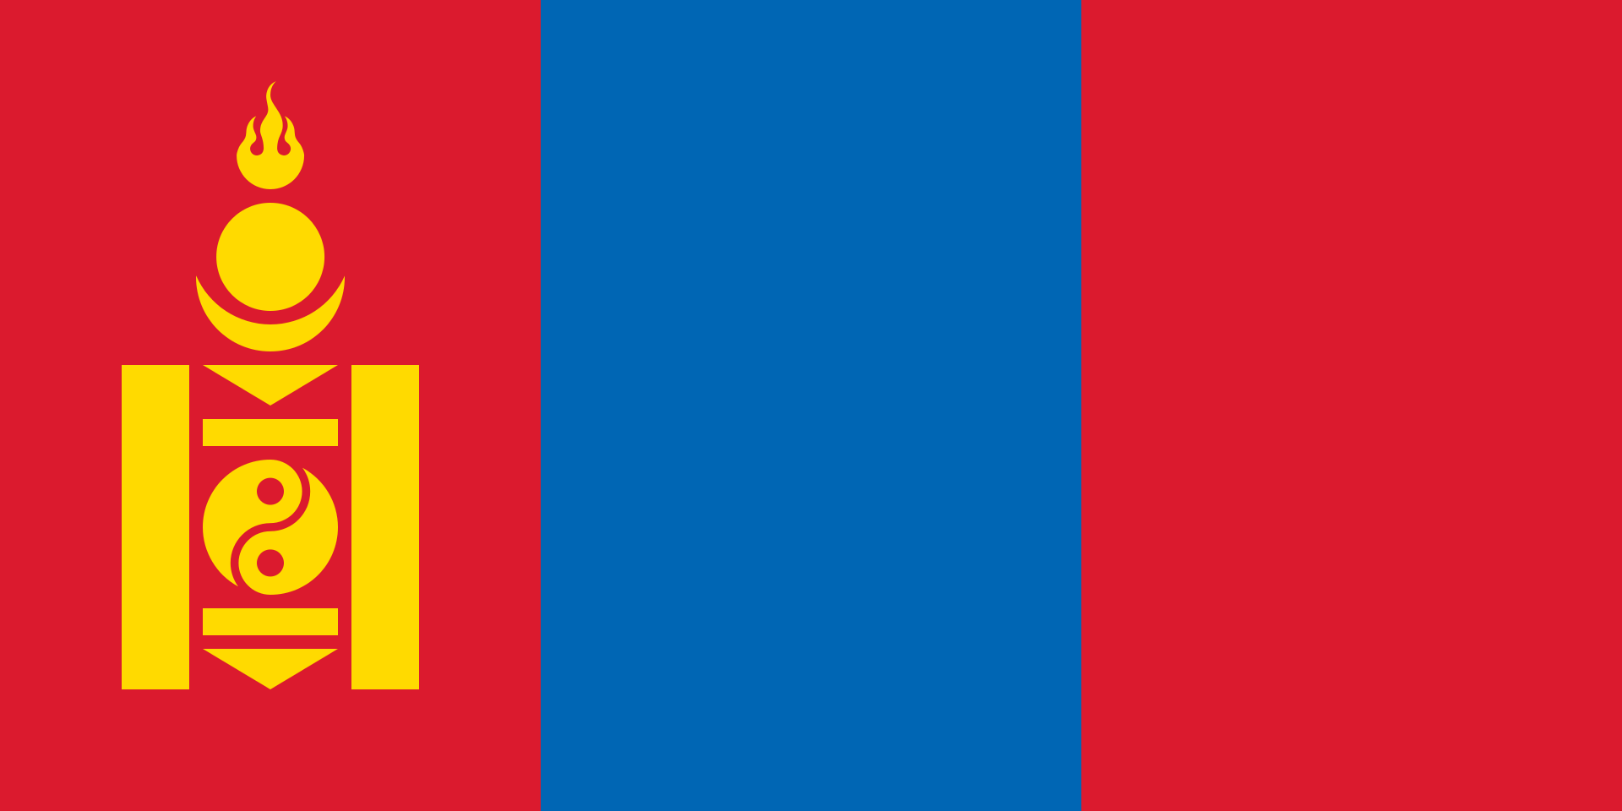 Flagge im Querformat Land Mongolei 150x100 cm